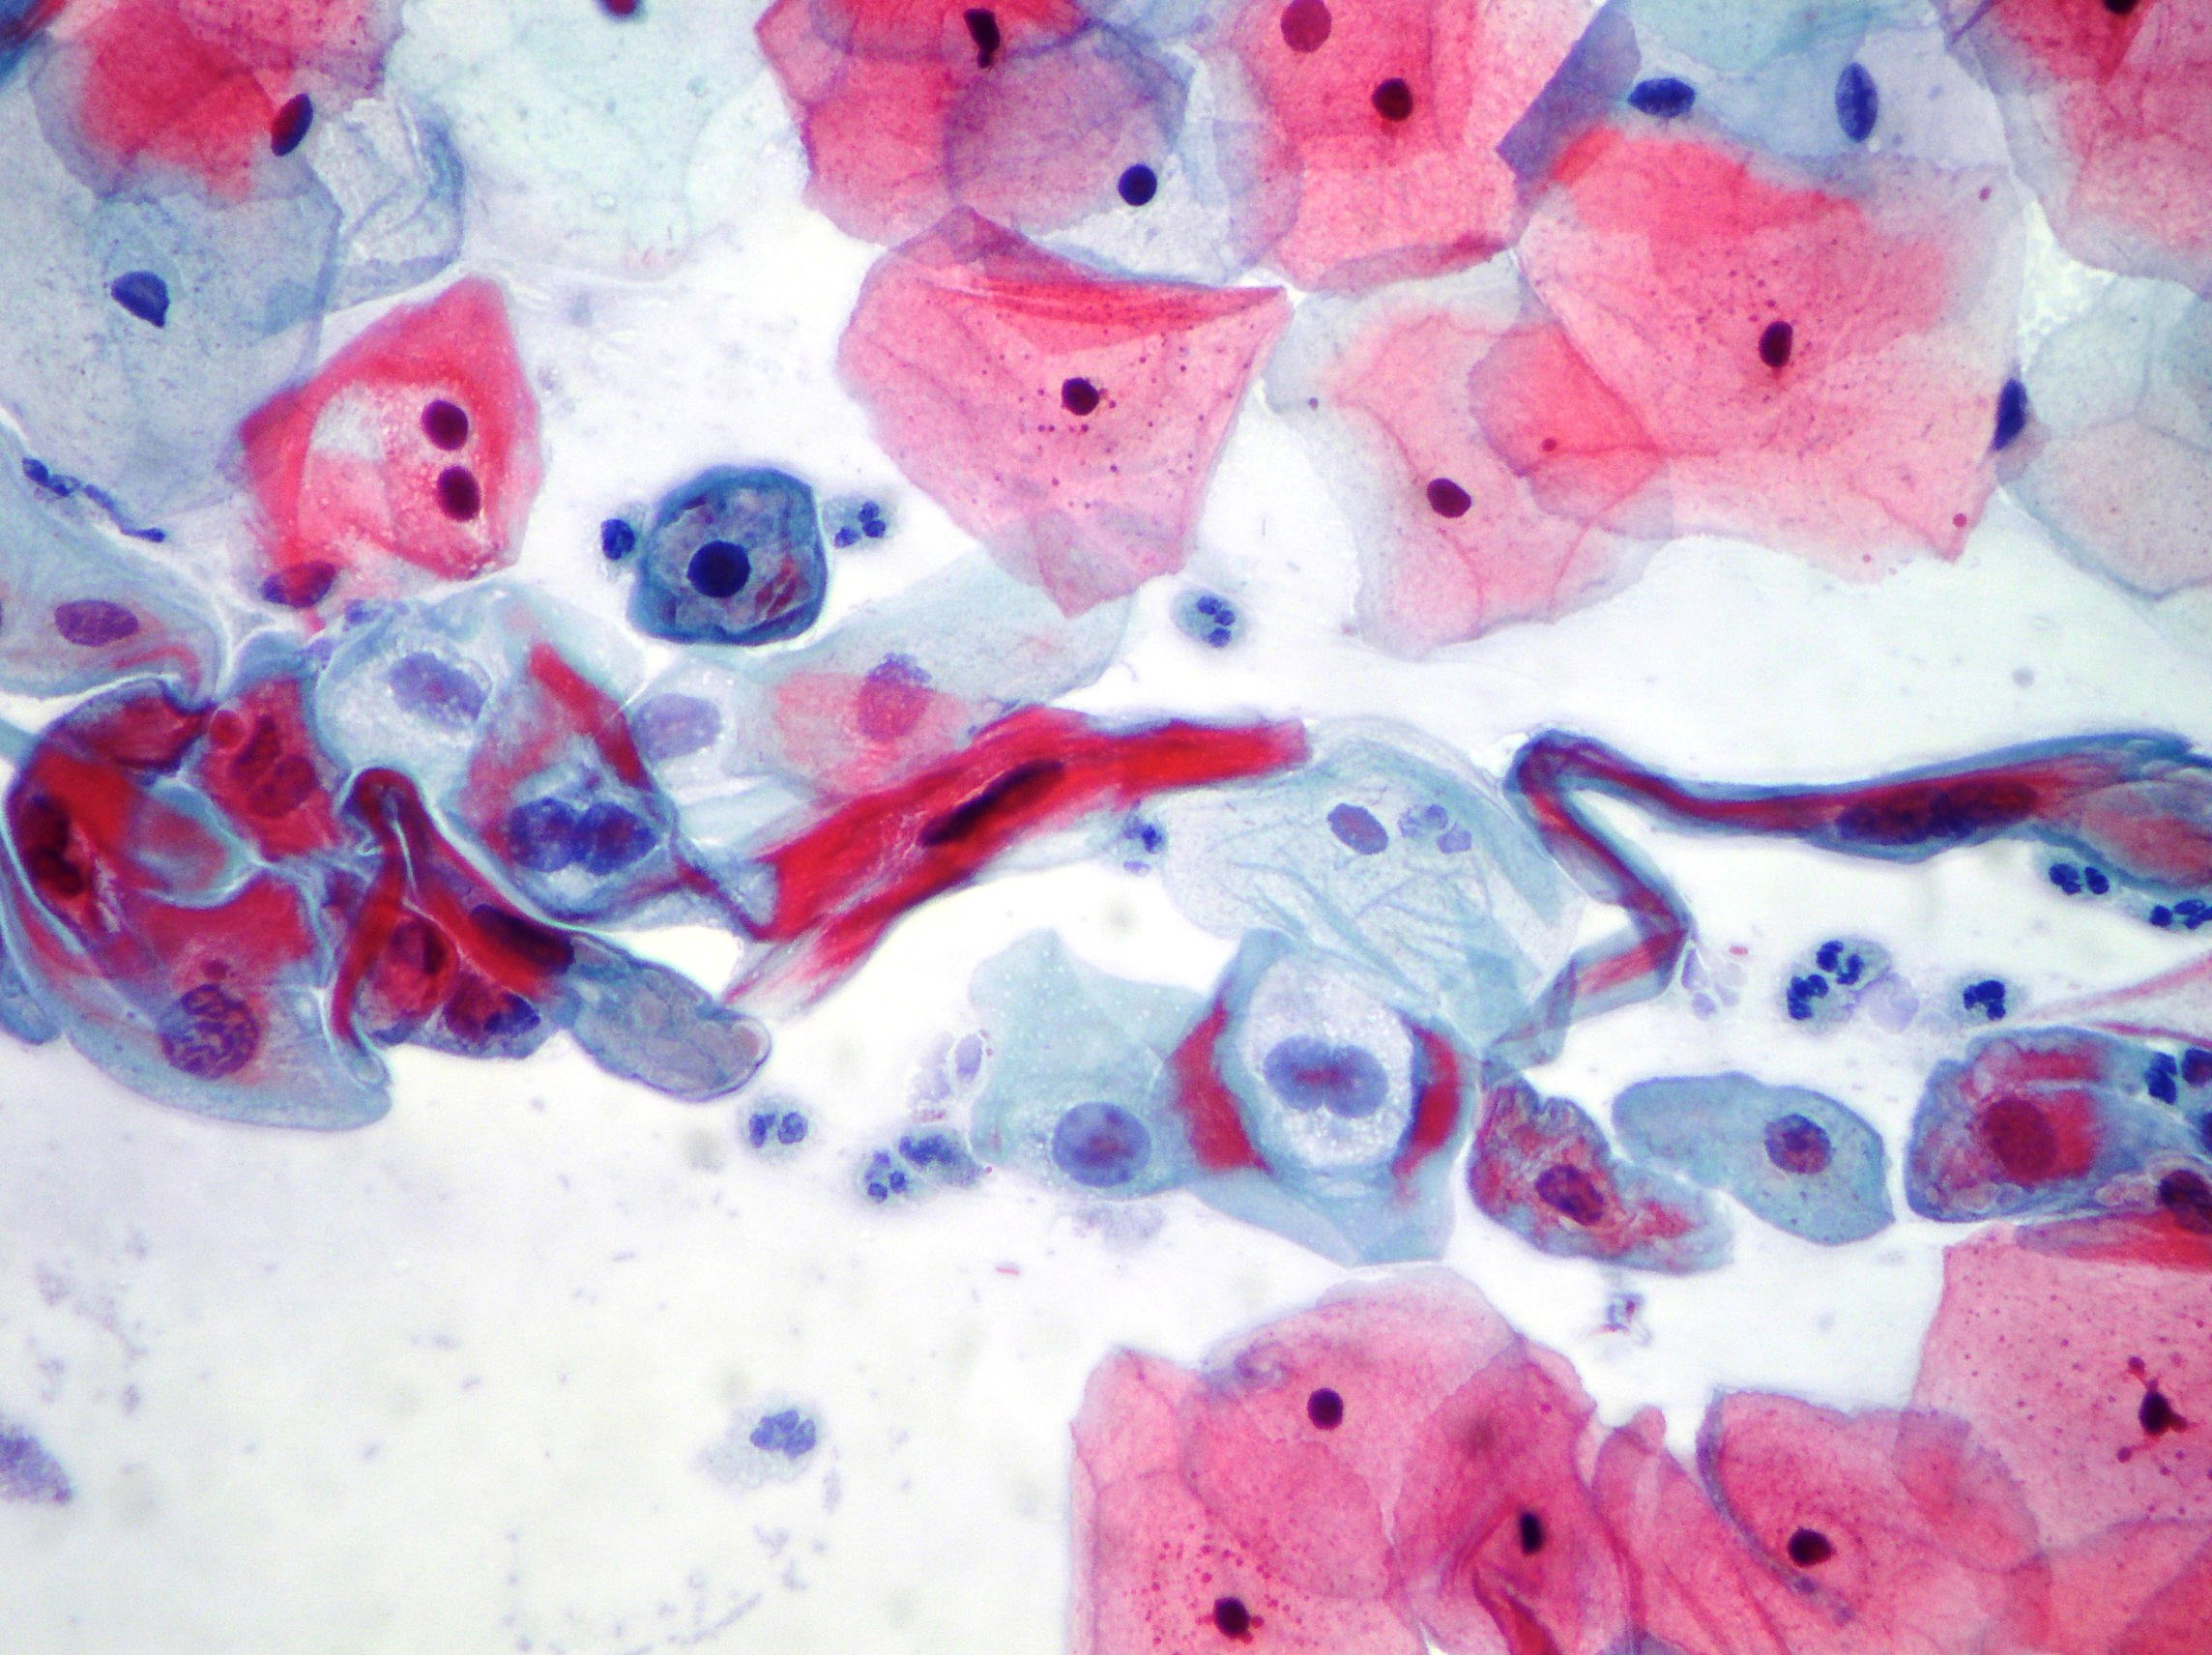 Uterine cervix - LSIL